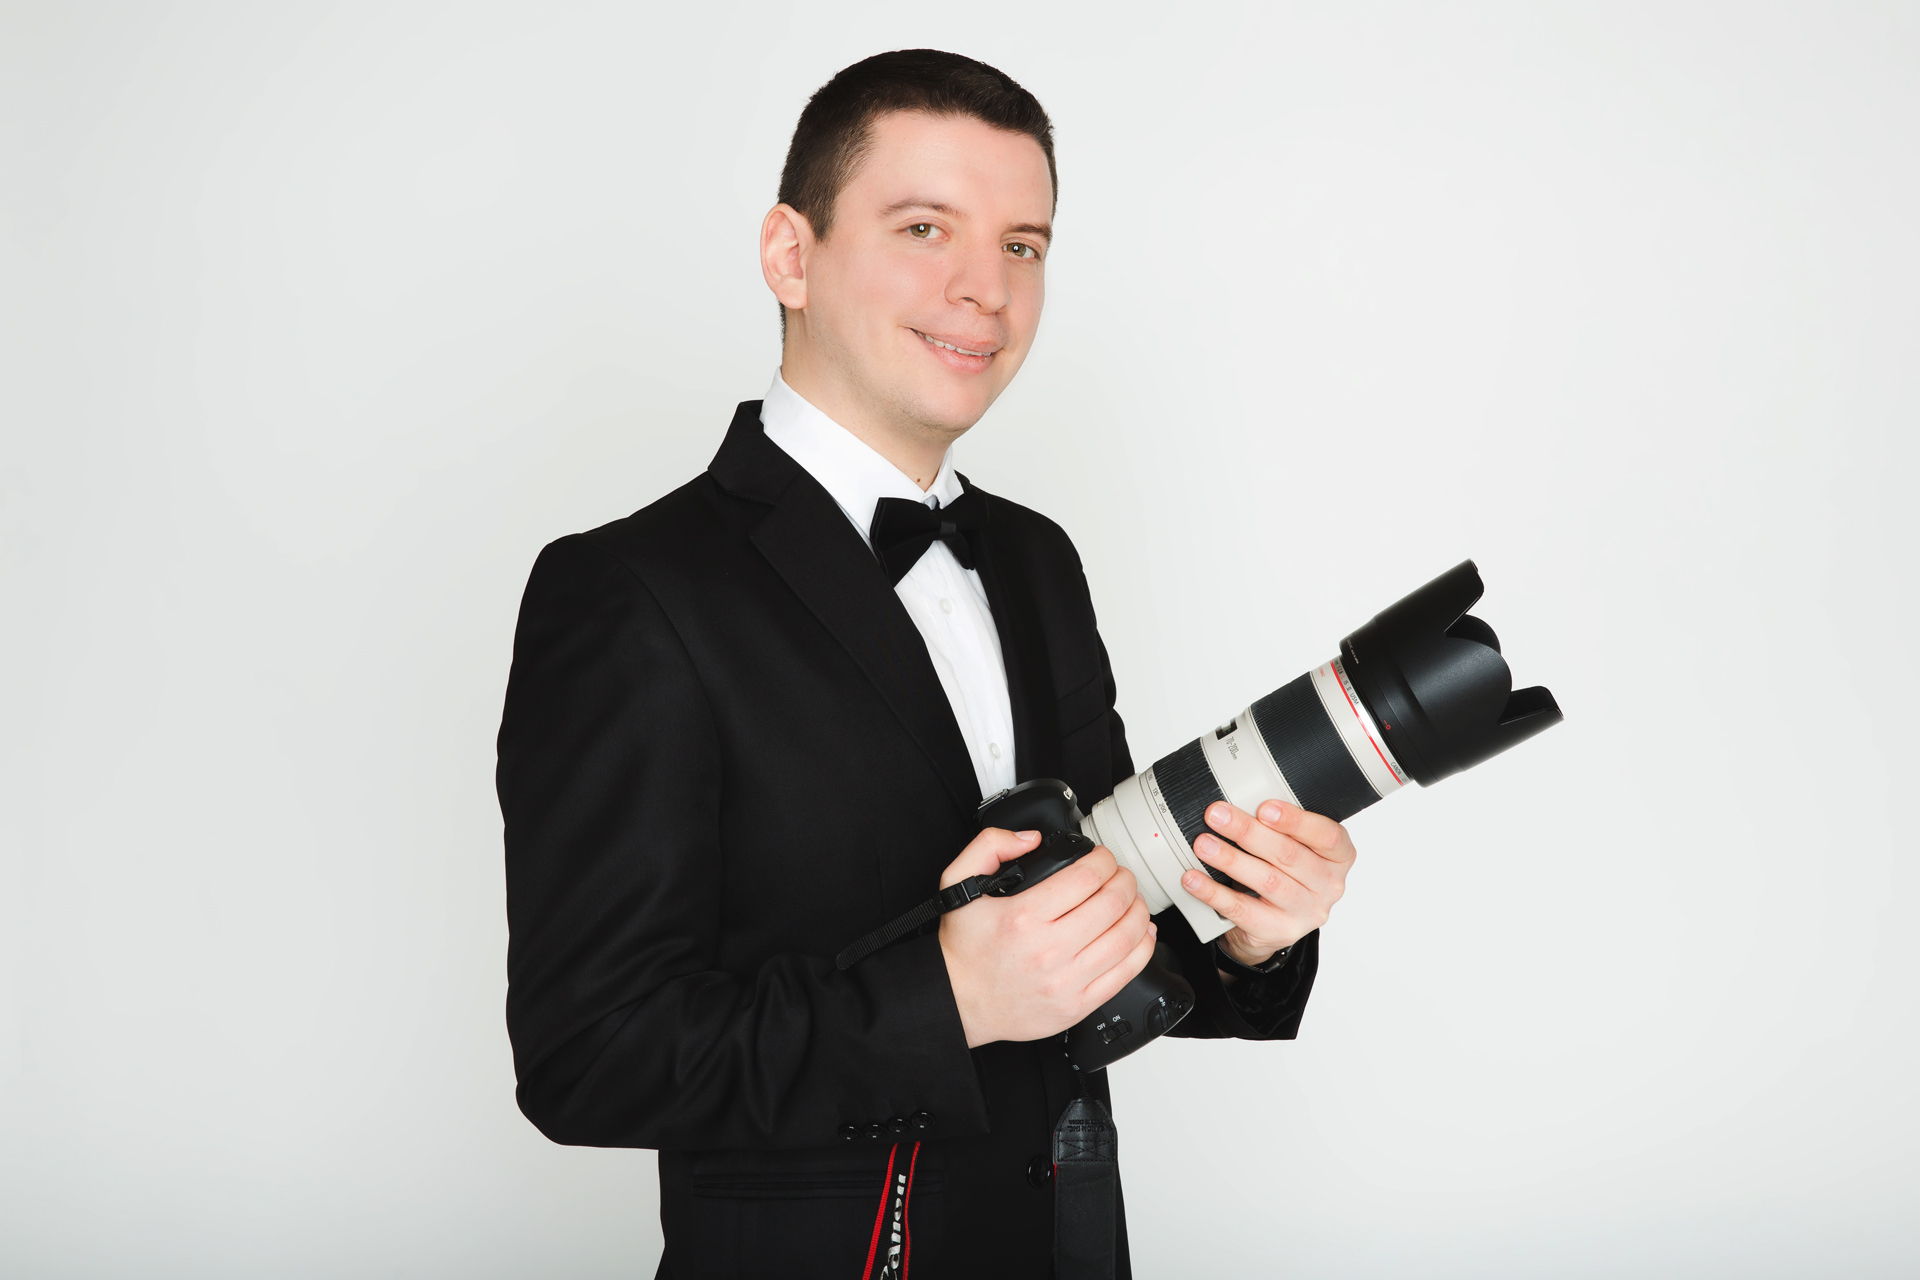 Fotograf in München